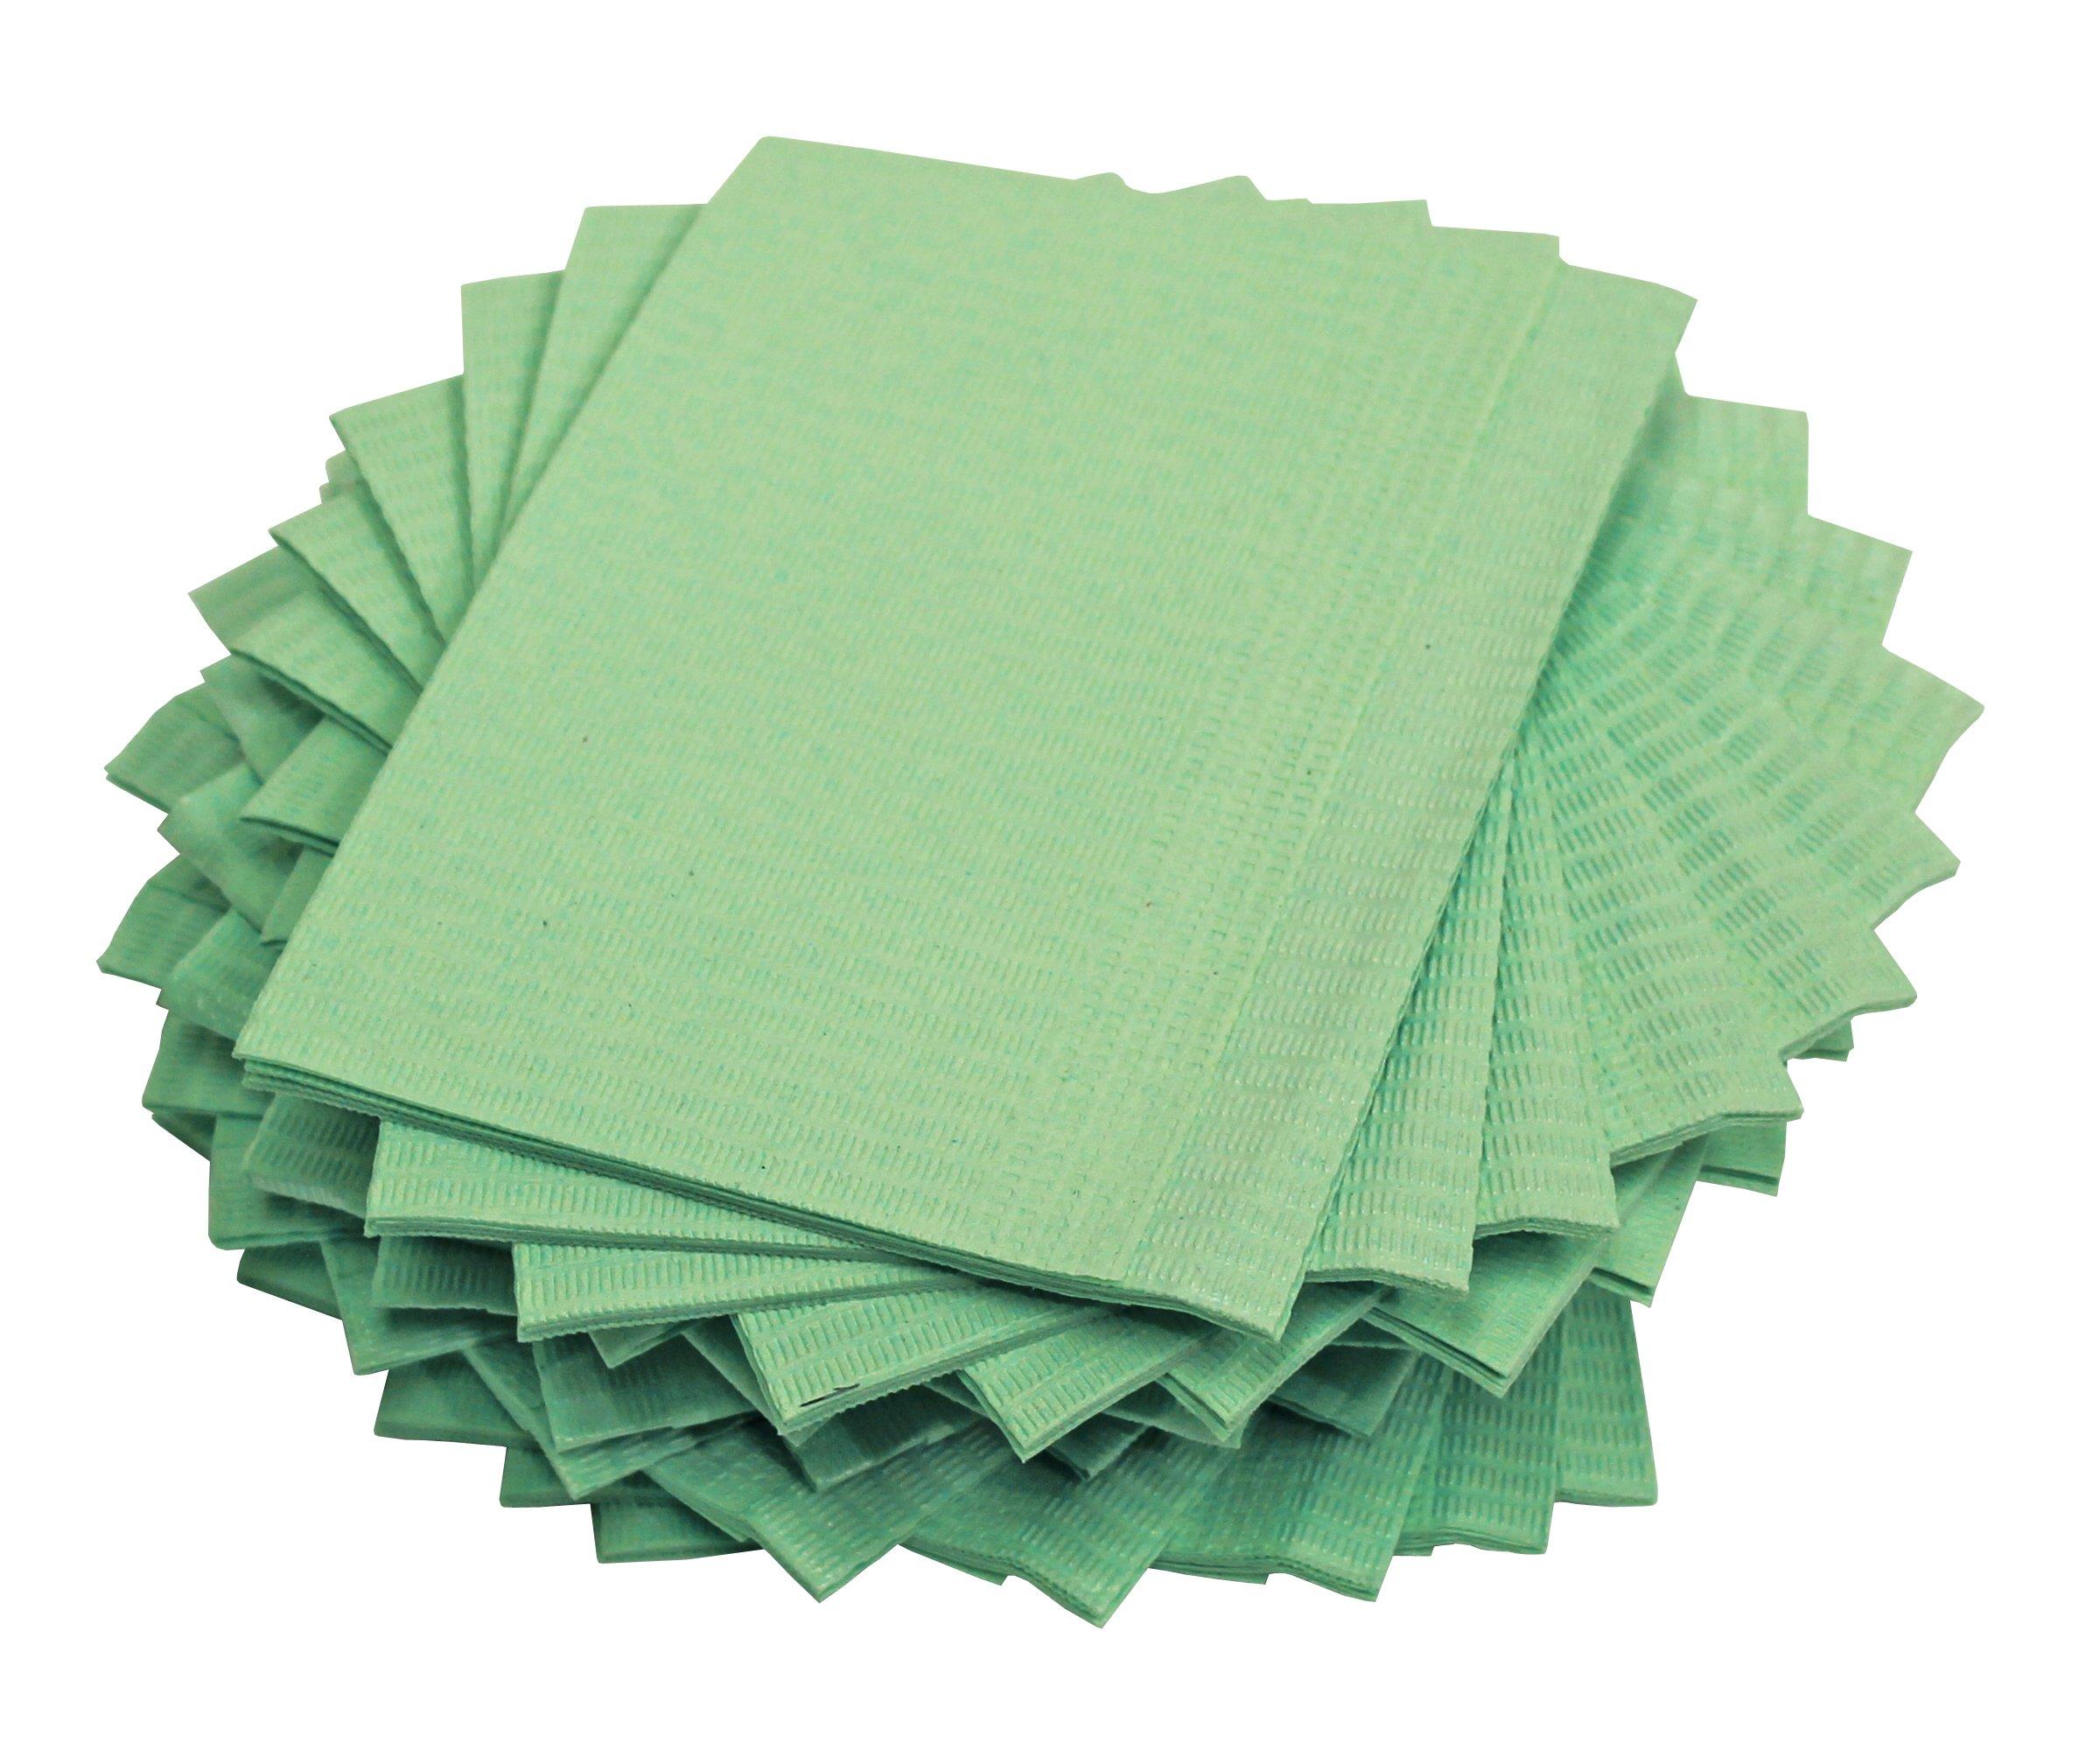 Adenna Dental Bibs/Lap Cloths, Green (Box of 500)